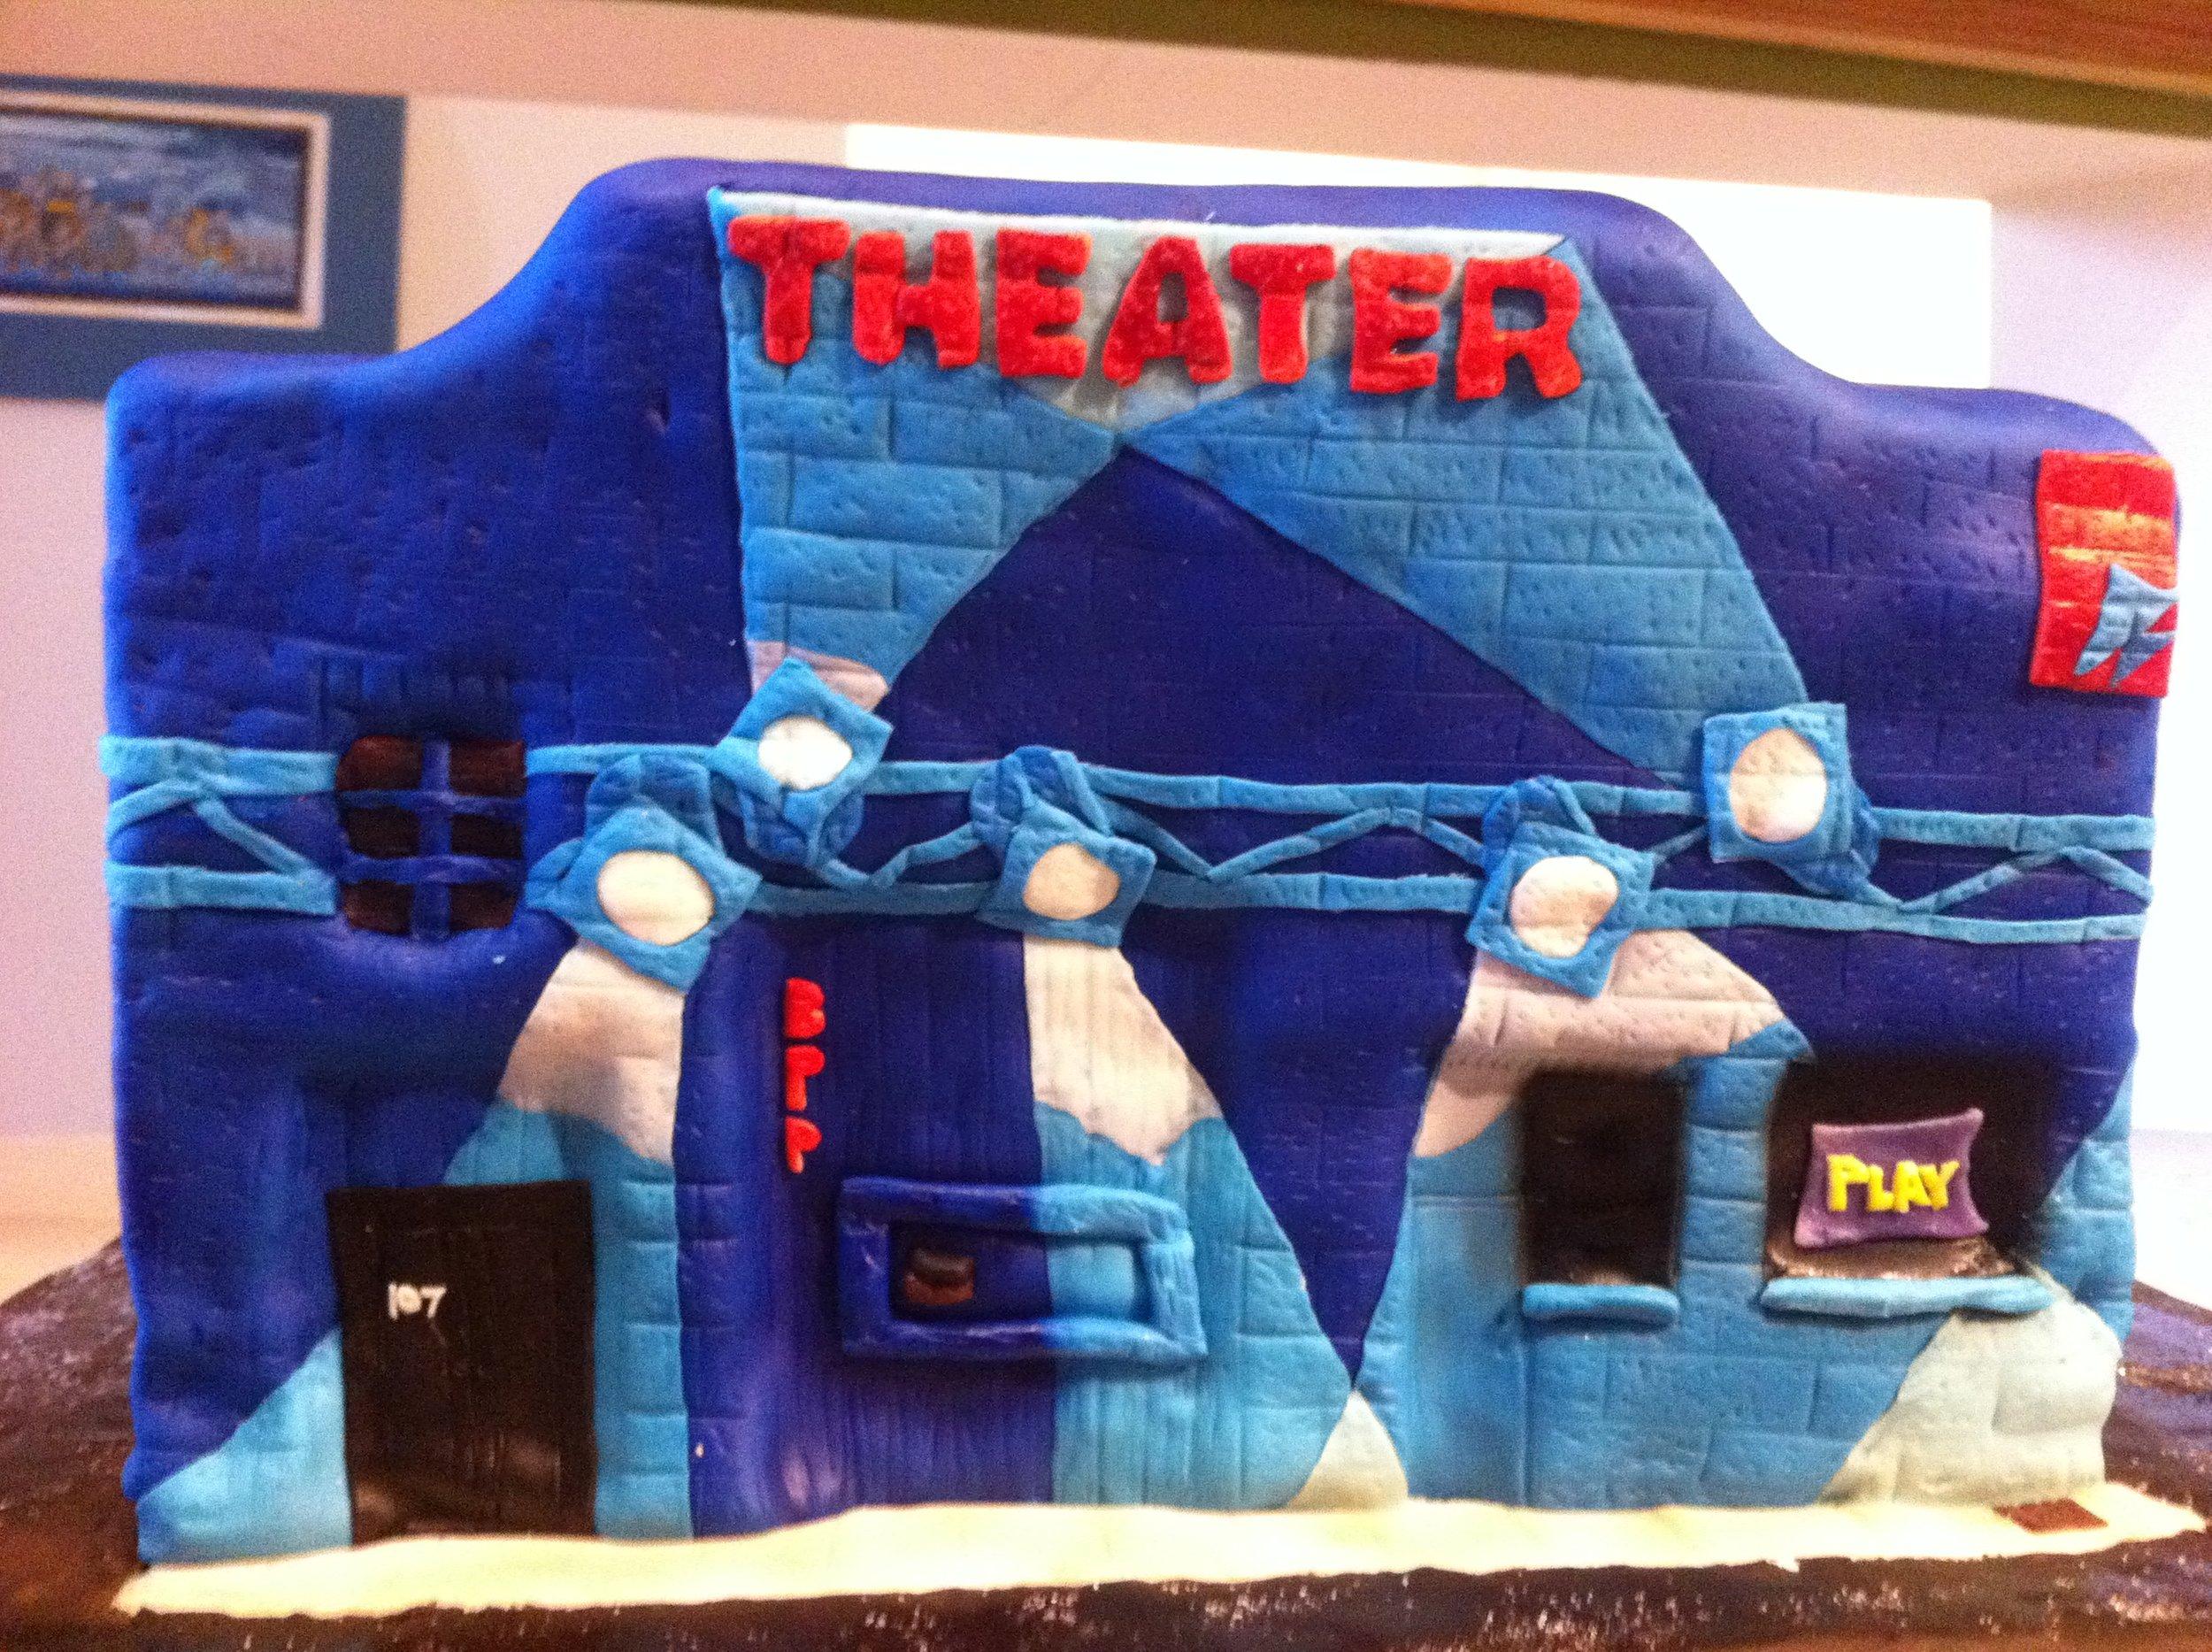 Theater Cake.JPG